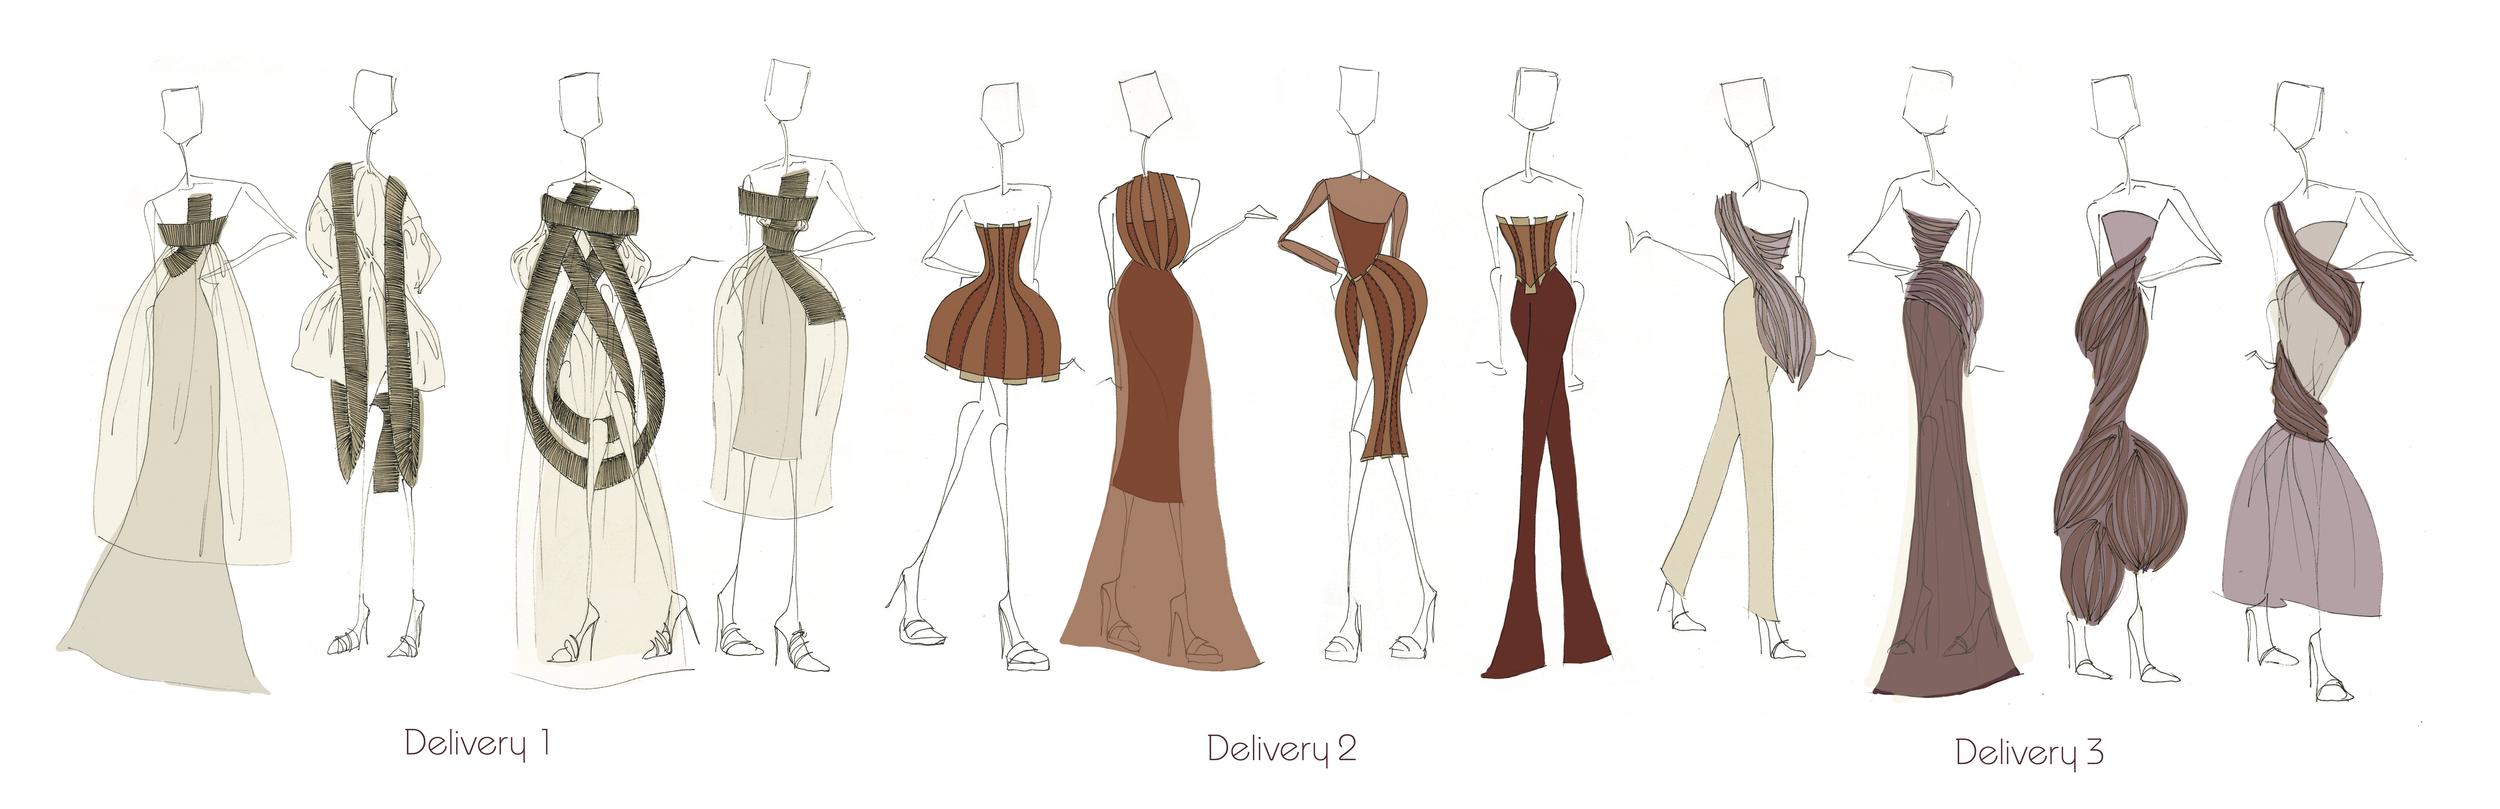 EveningwearSketches-website.jpg